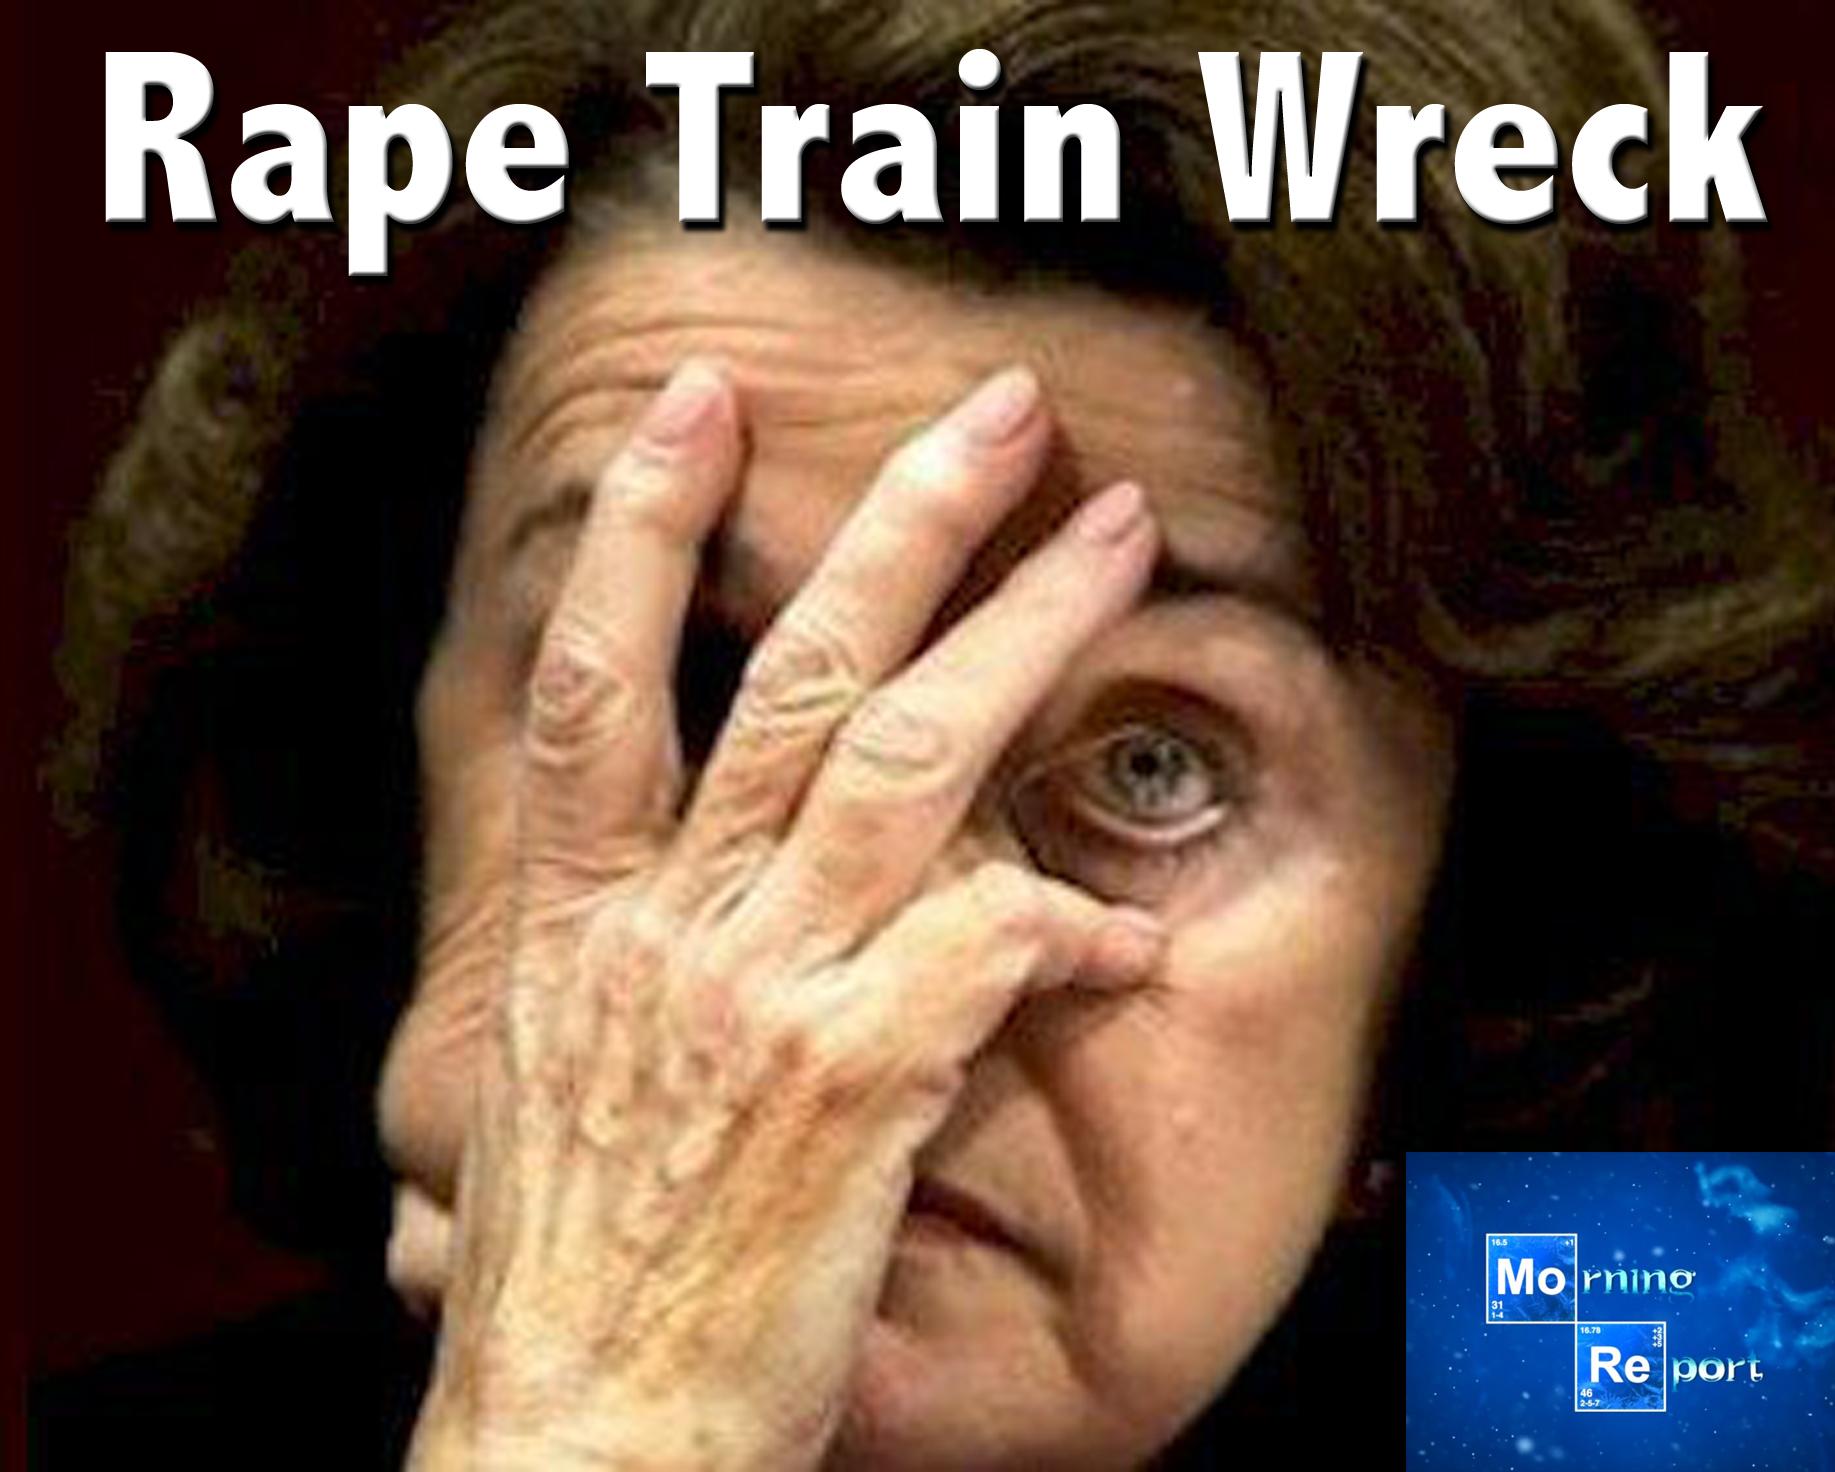 rapewreck.jpg